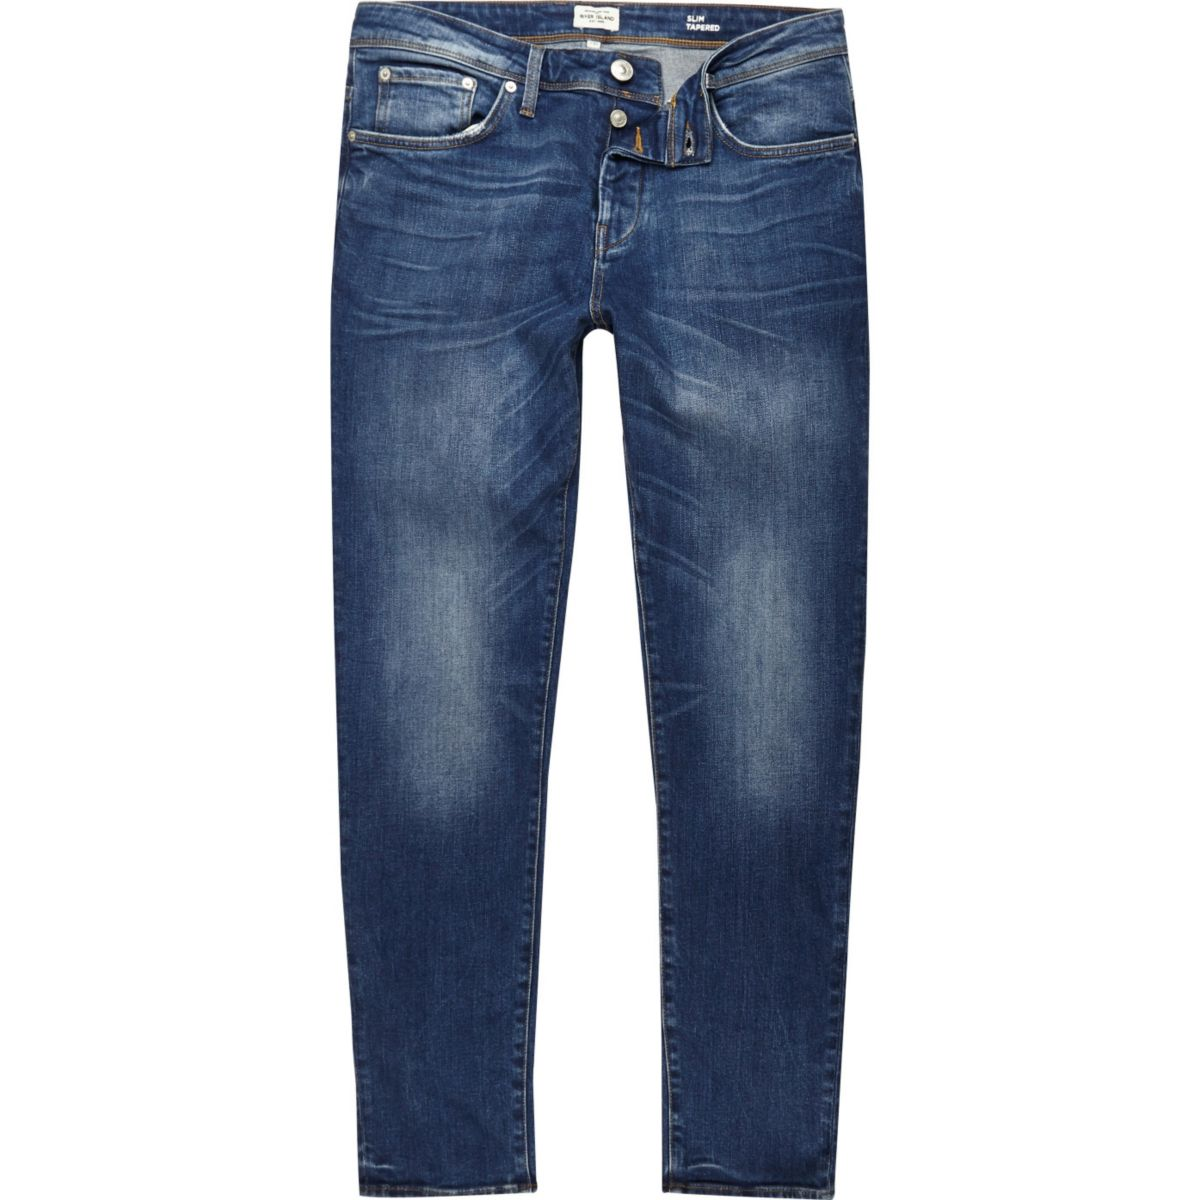 Jimmy blauwe slim-fit smaltoelopende jeans